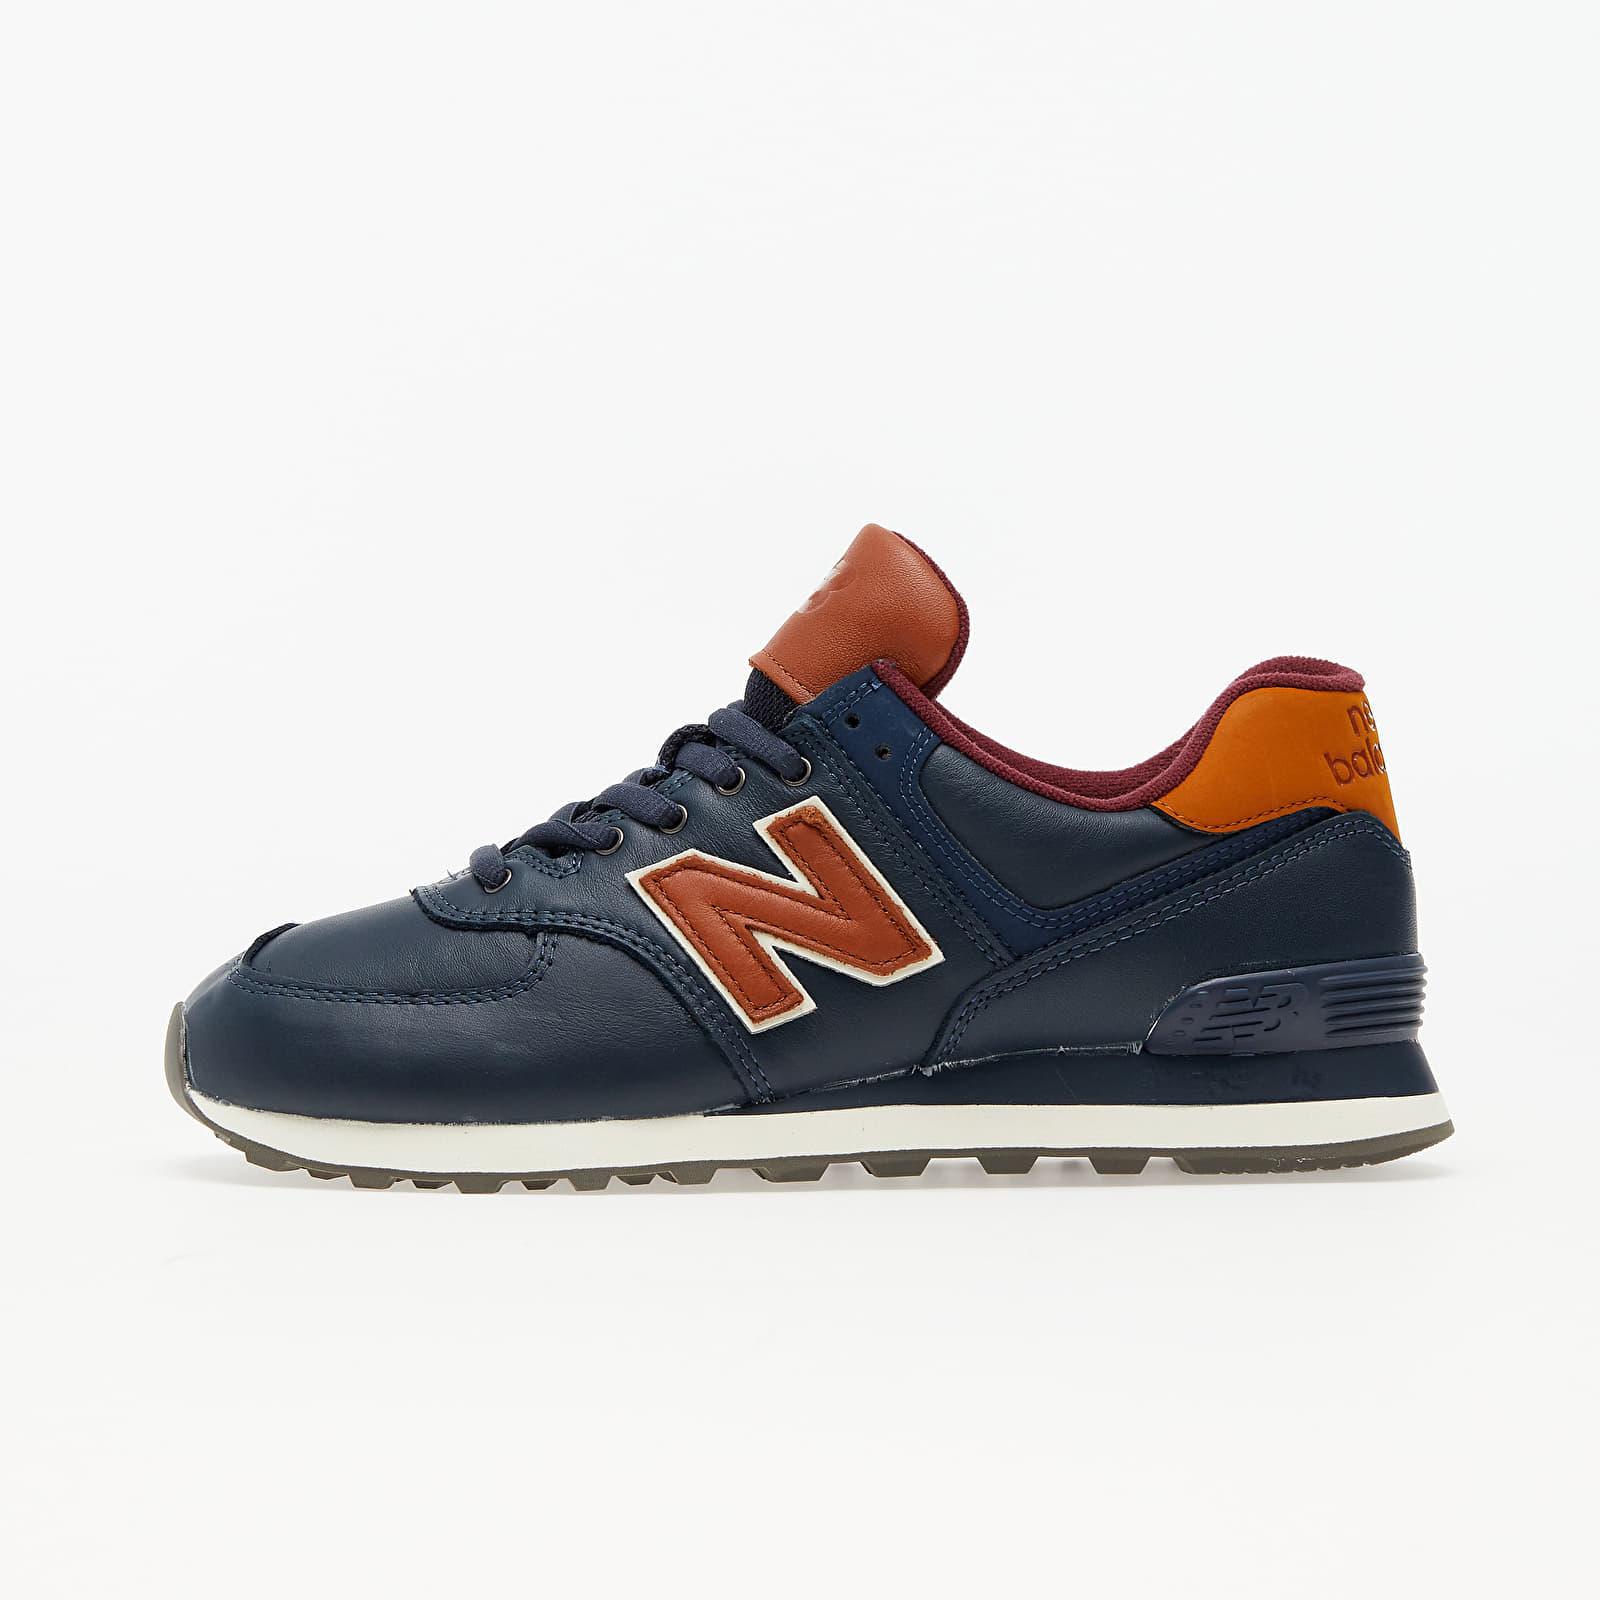 New Balance 574 Natural indigo/ Saddle Brown EUR 44